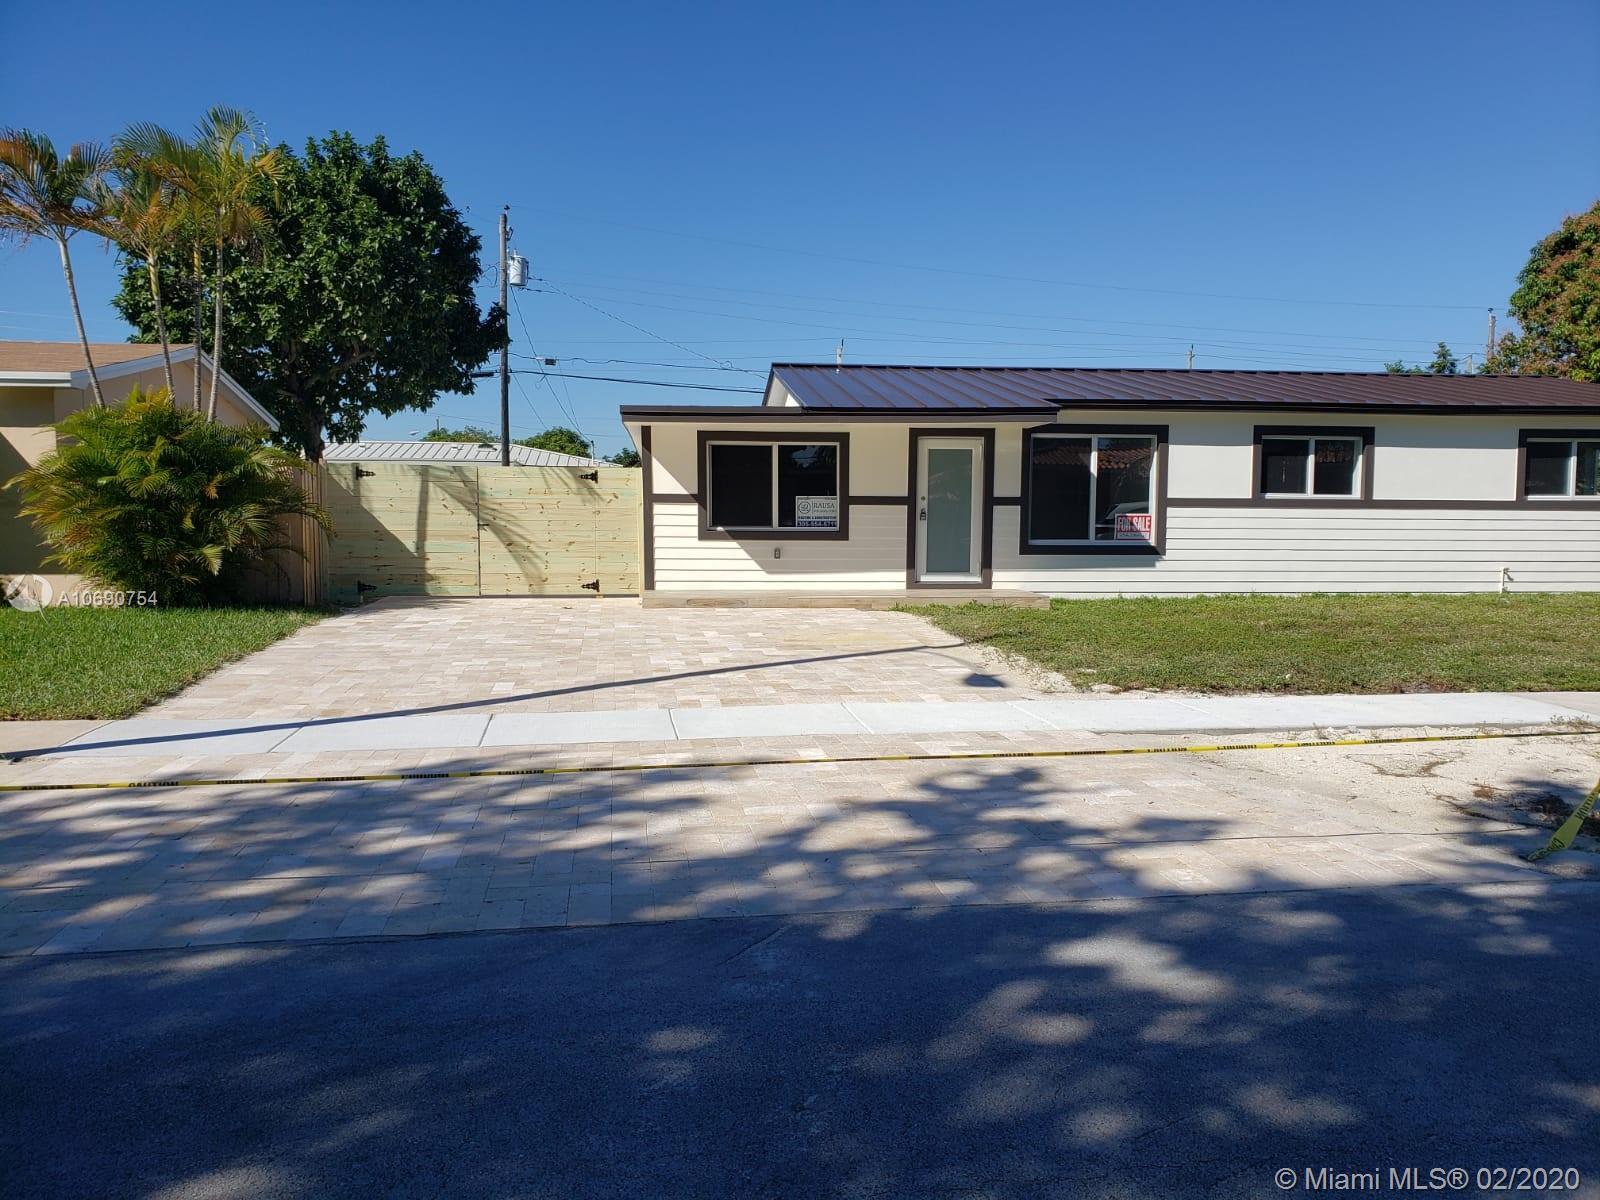 7030 W 10th Ave, Hialeah FL 33014